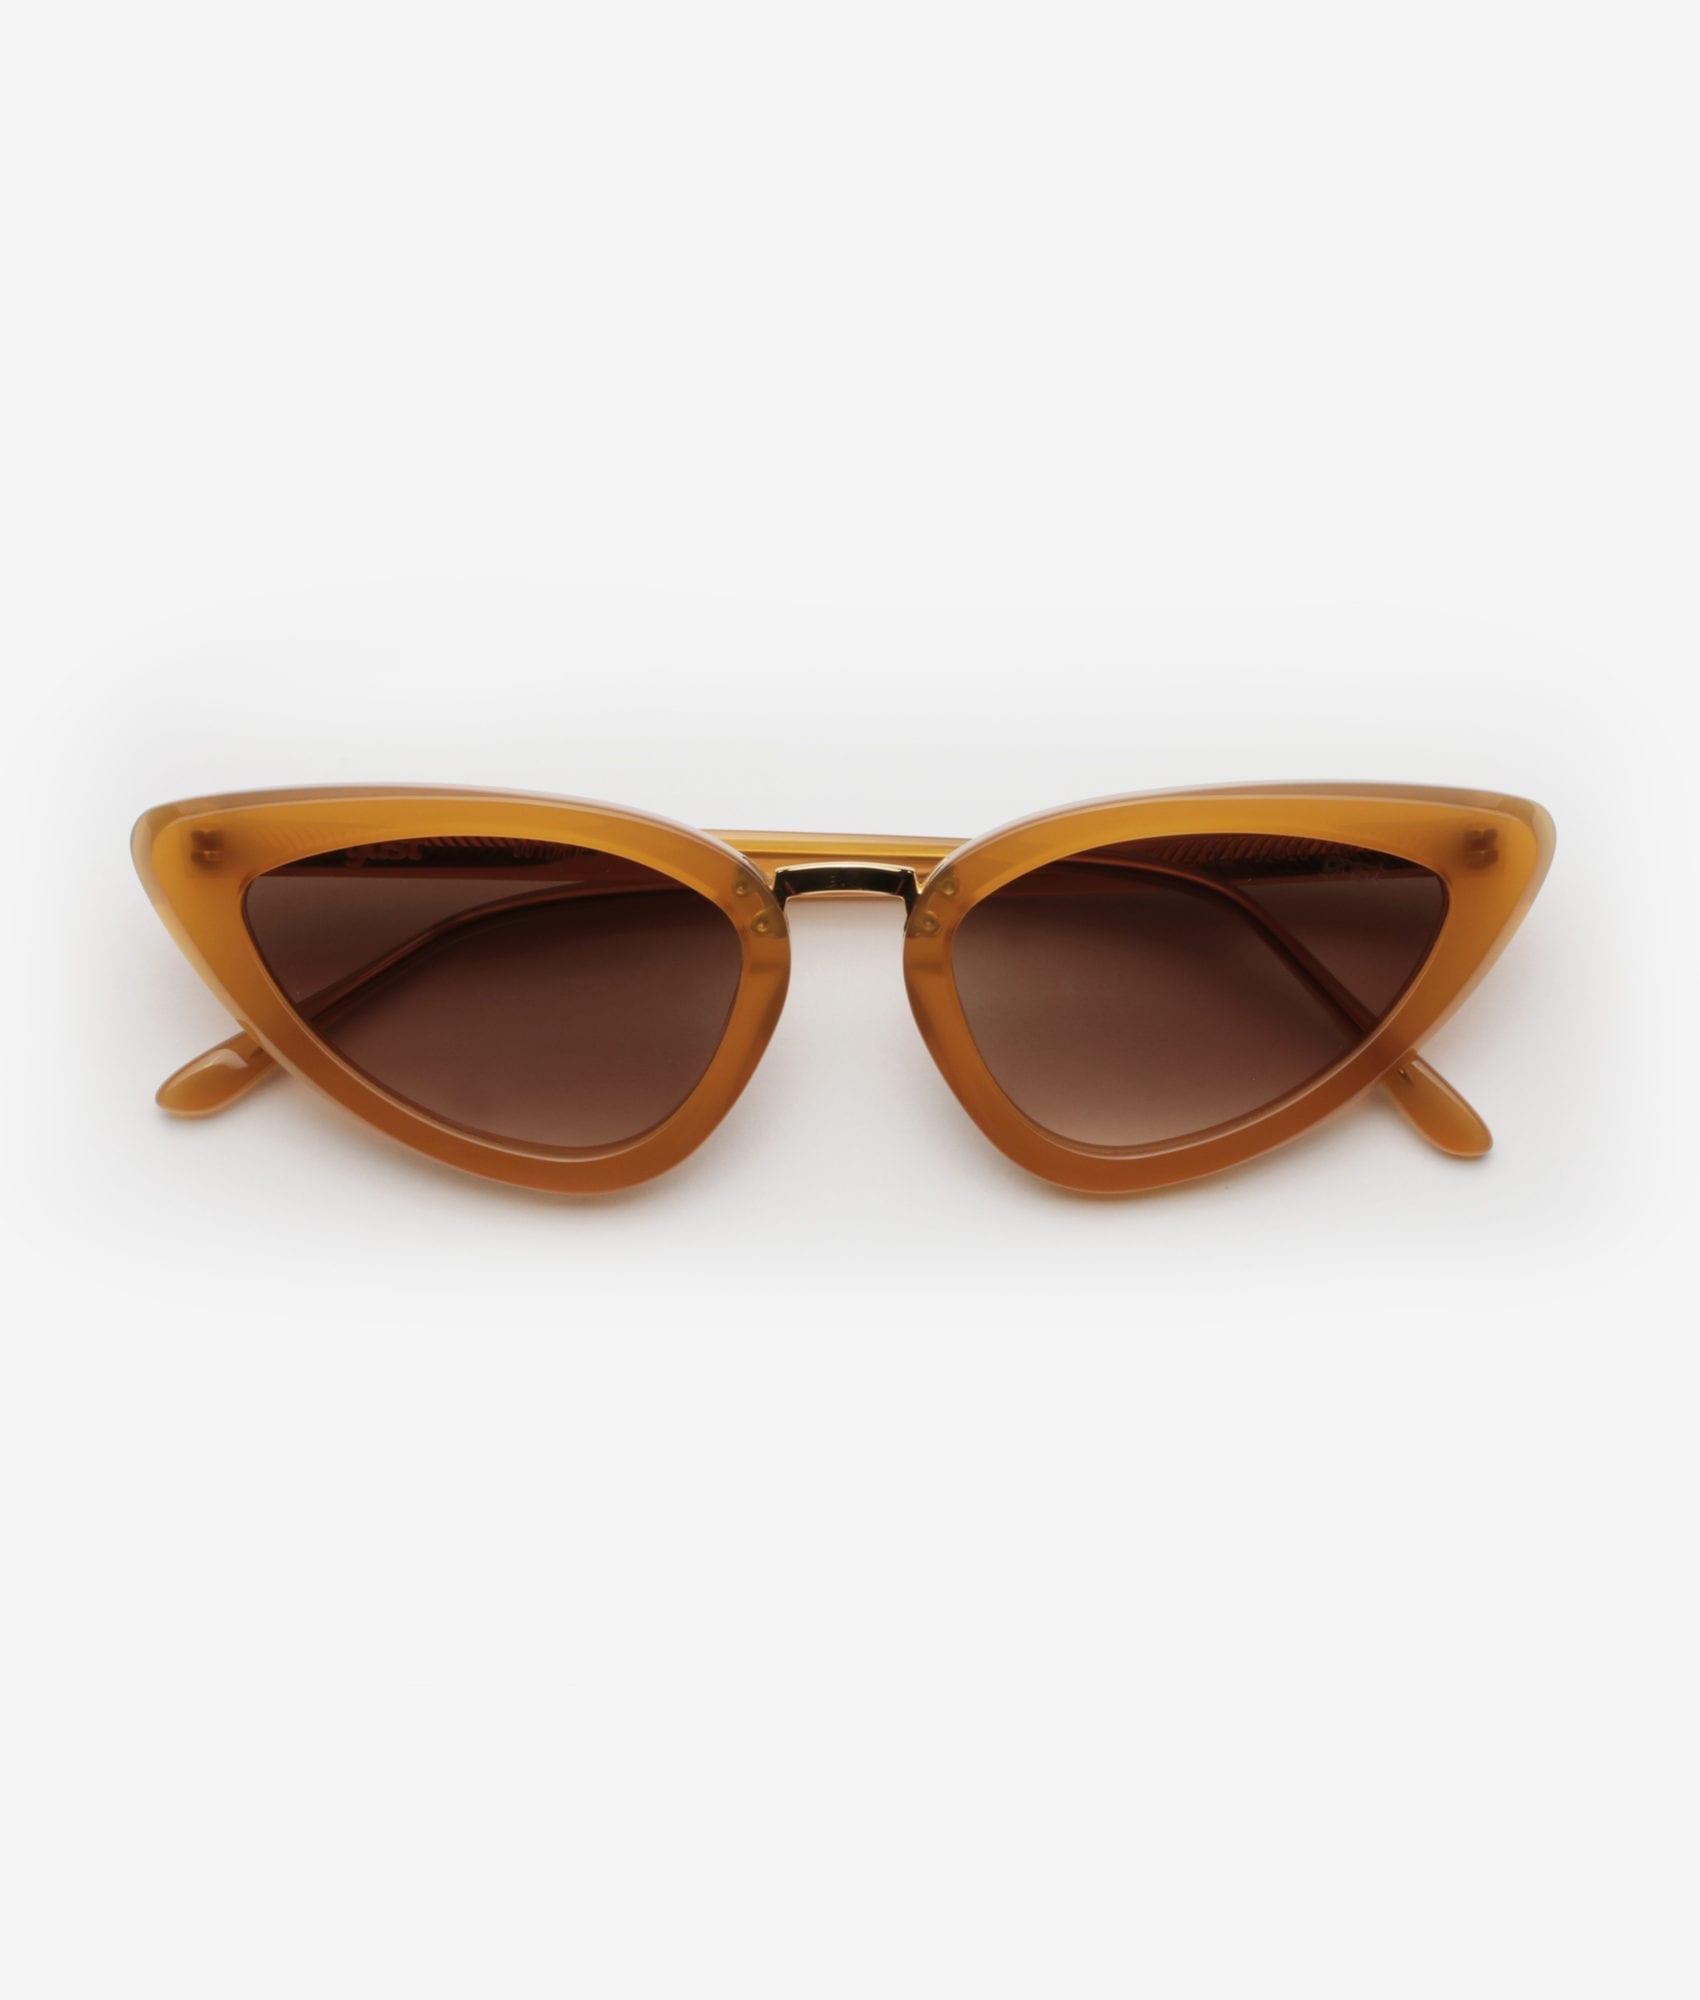 VENTI144 Amber Gast Sunglasses